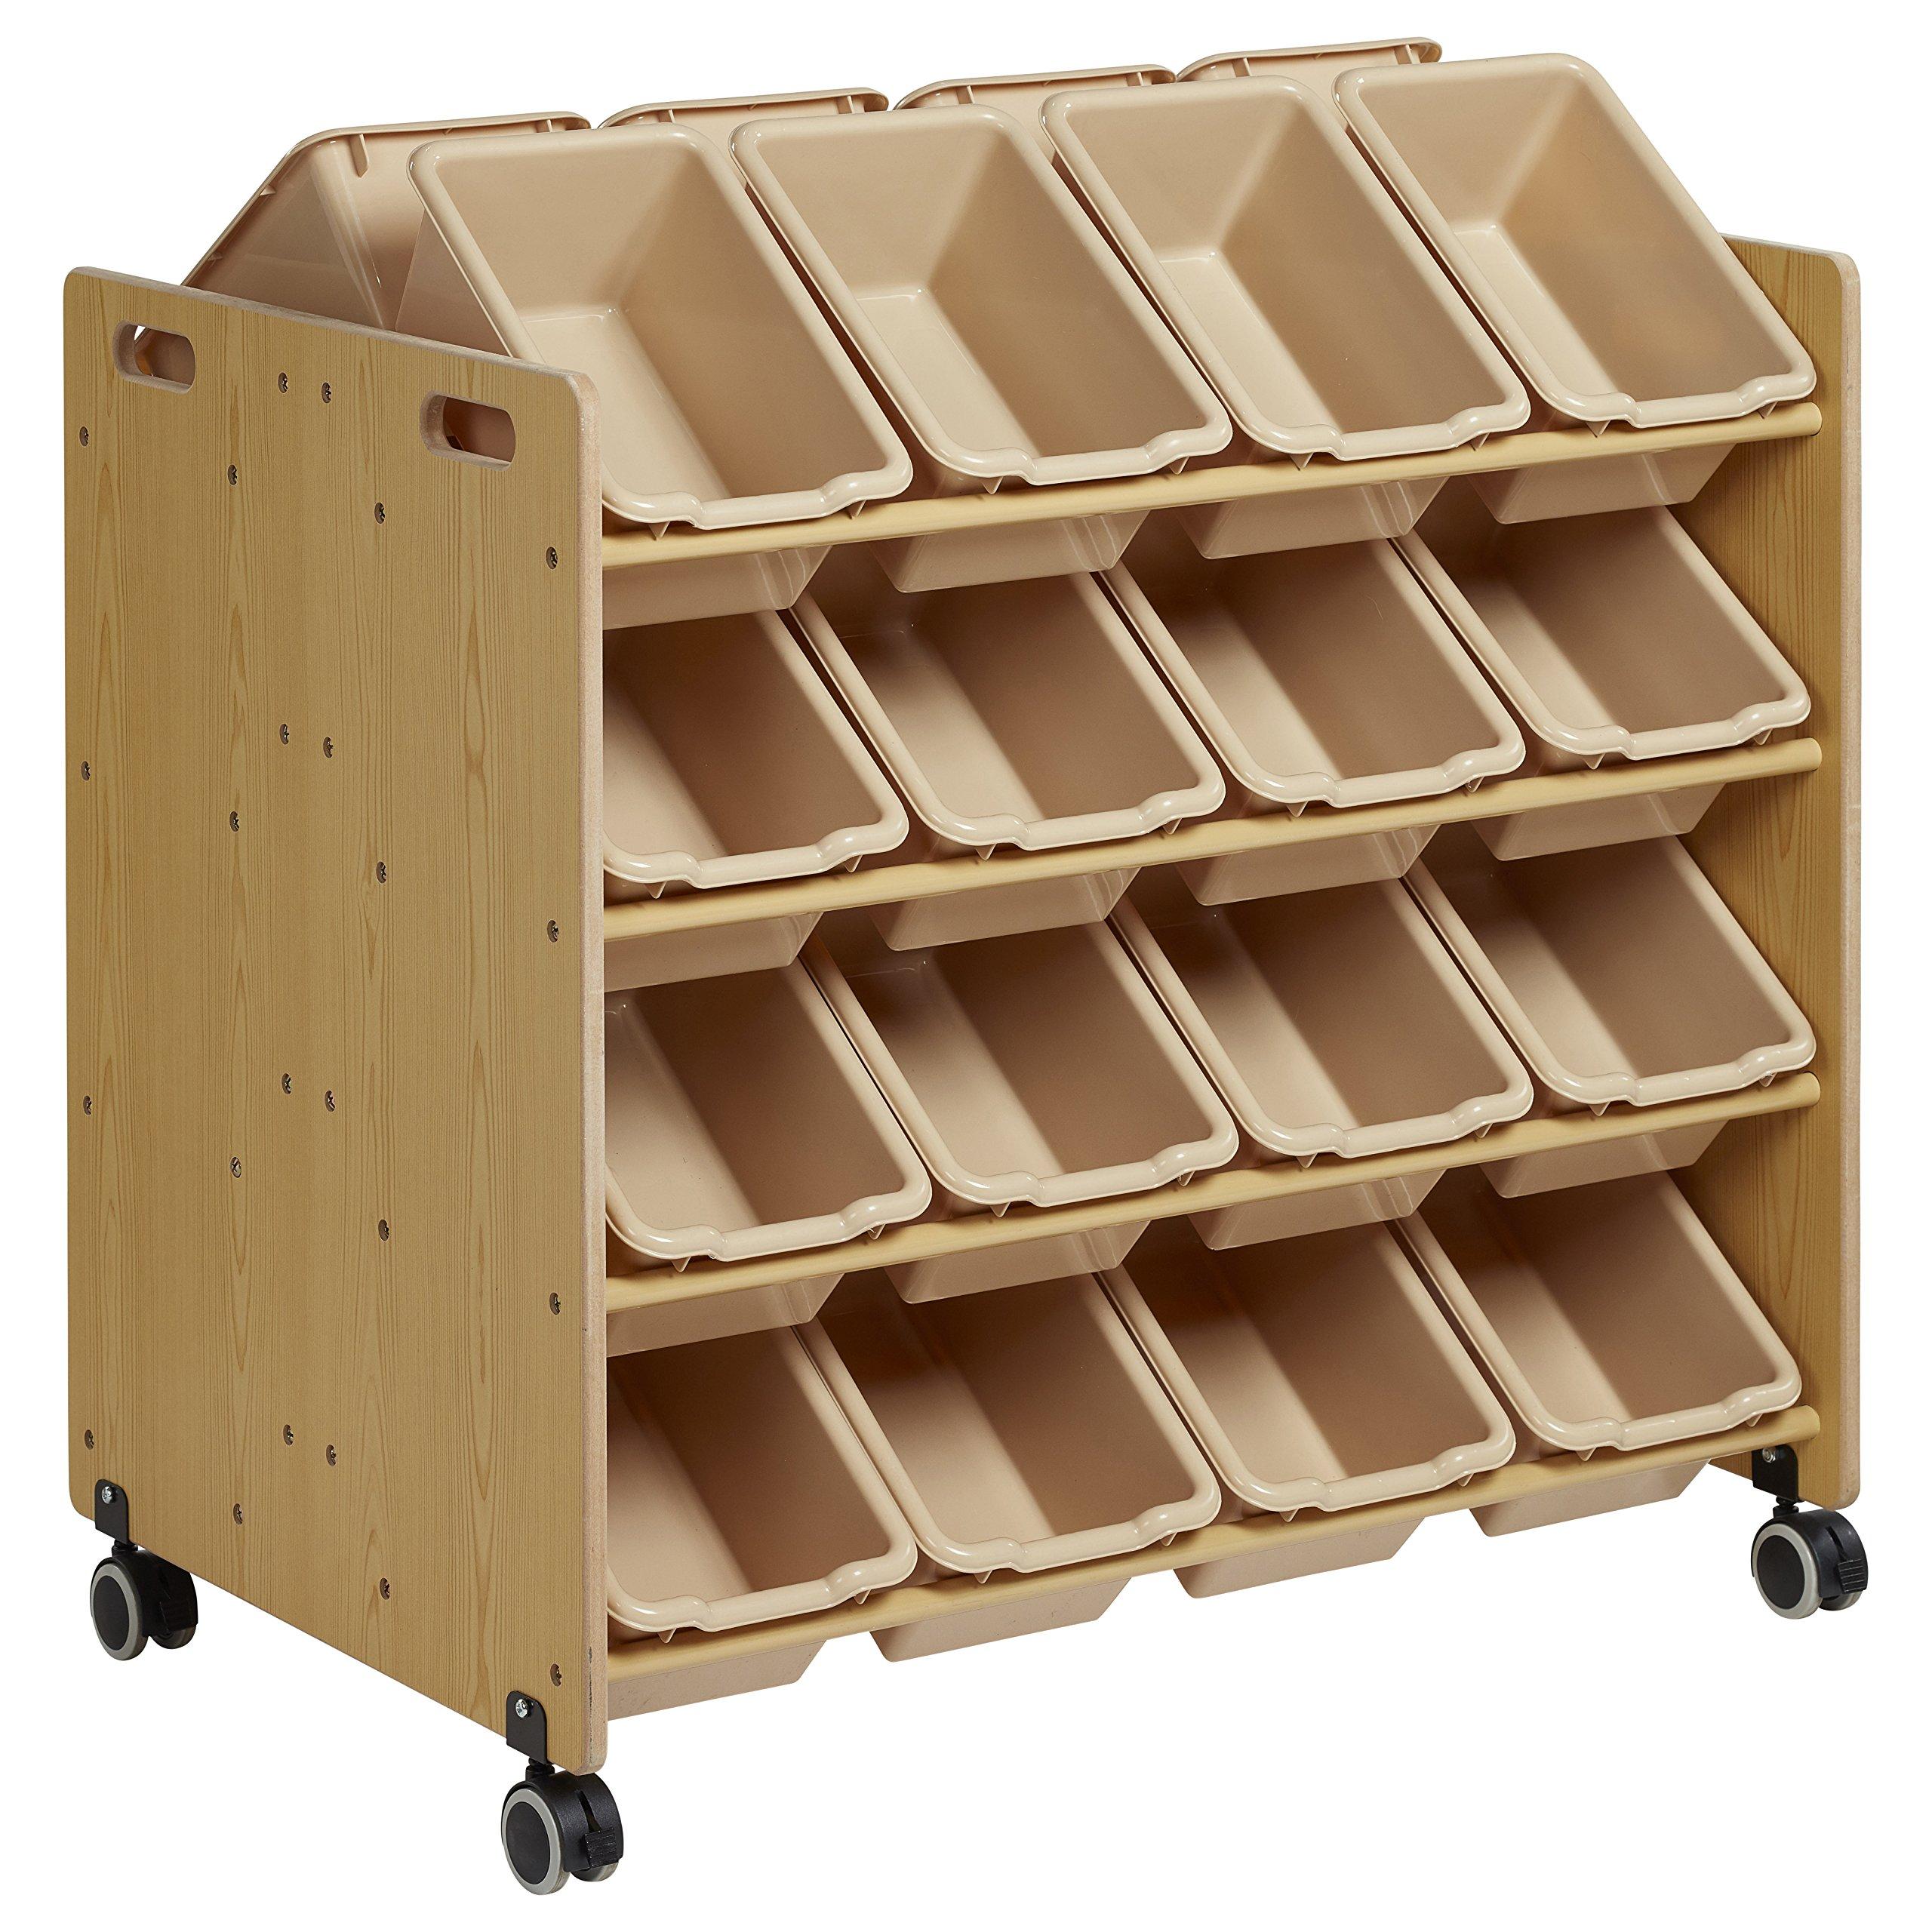 ECR4Kids Double-Sided Mobile Storage Organizer with 32 Bins, Sand with Sand Bins